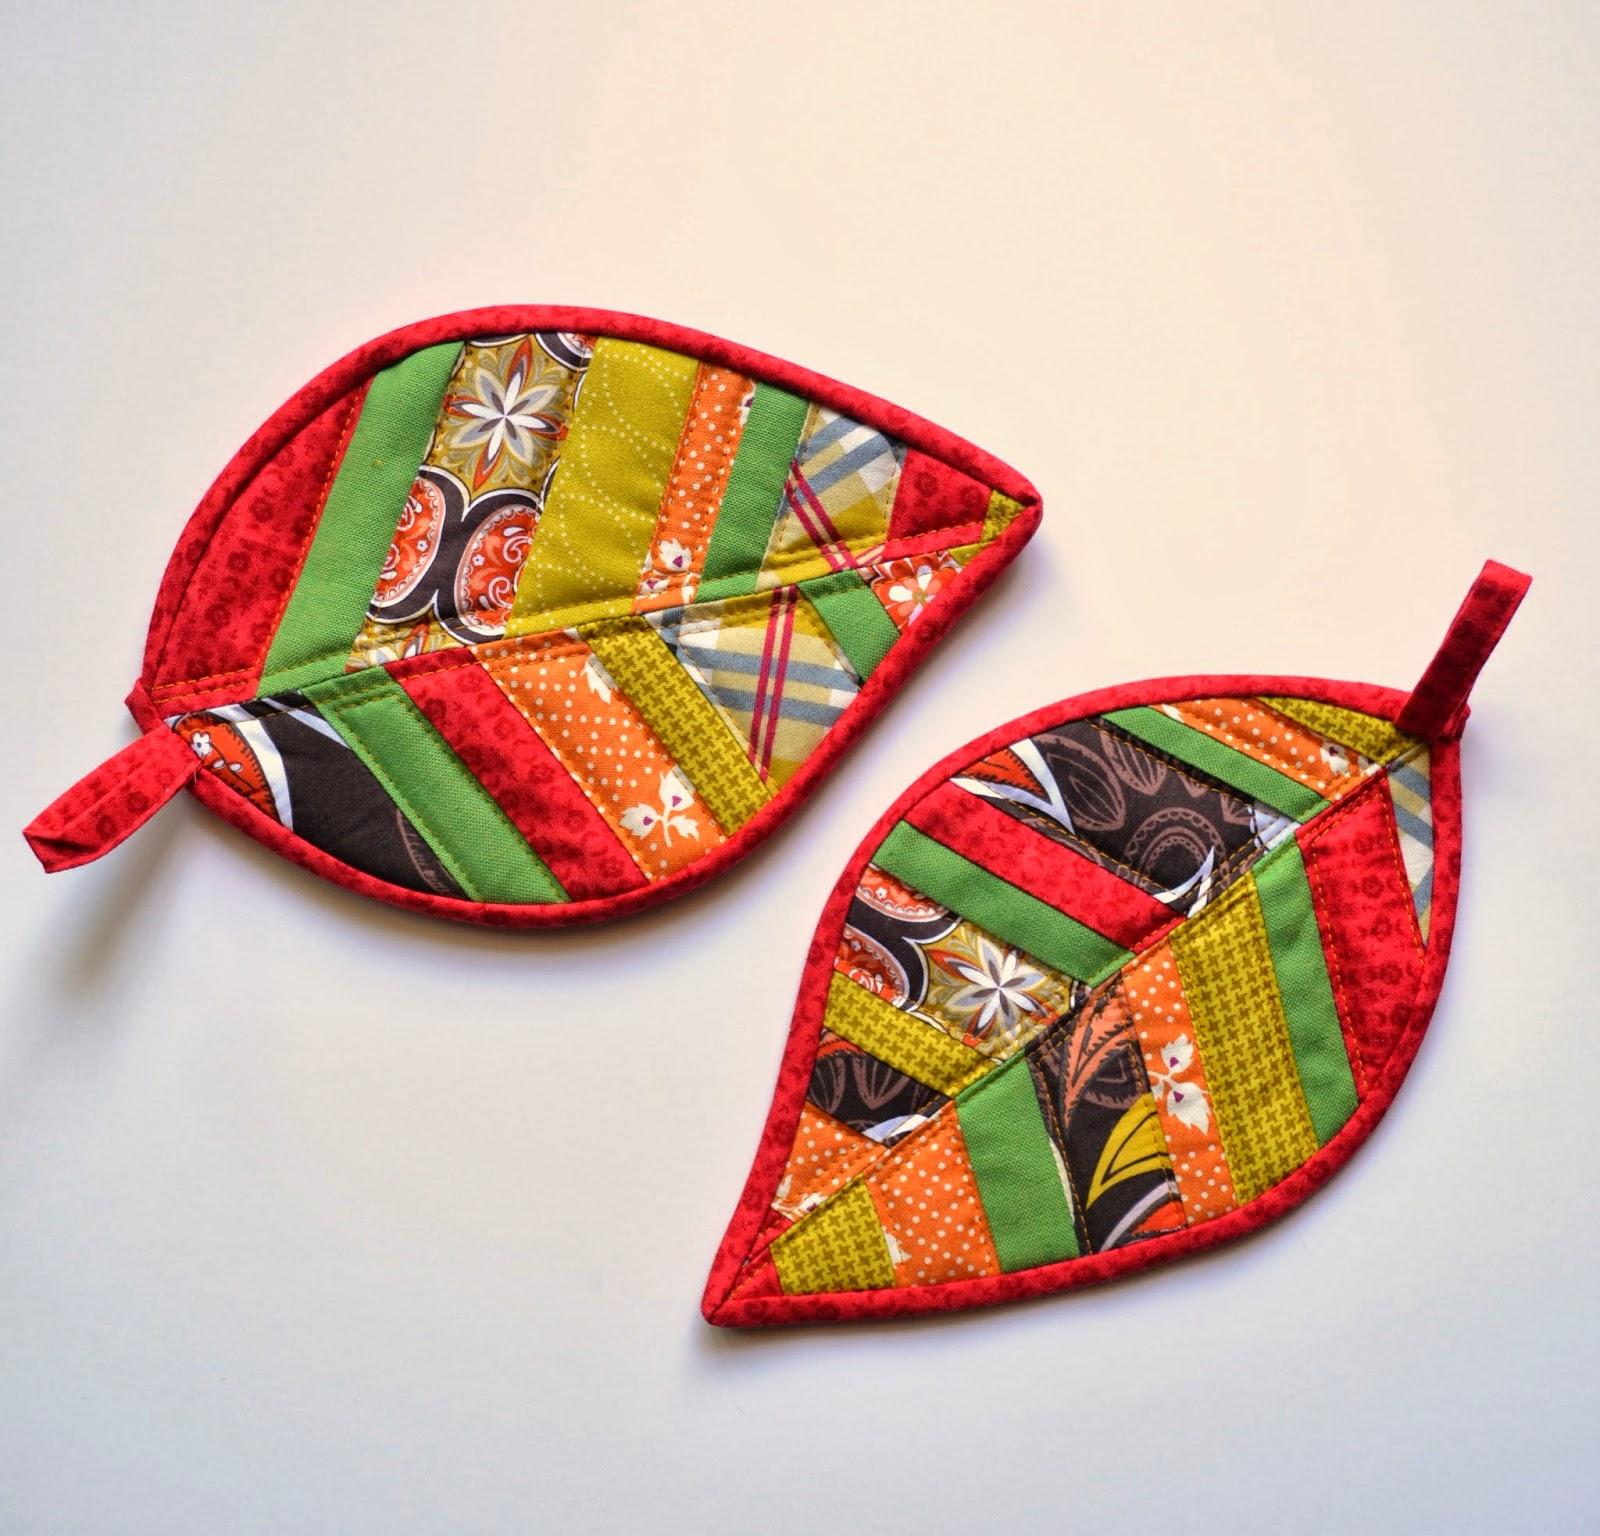 Half Stitched: Quilted Leaf Potholder ~ A Tutorial : quilt patterns for potholders - Adamdwight.com